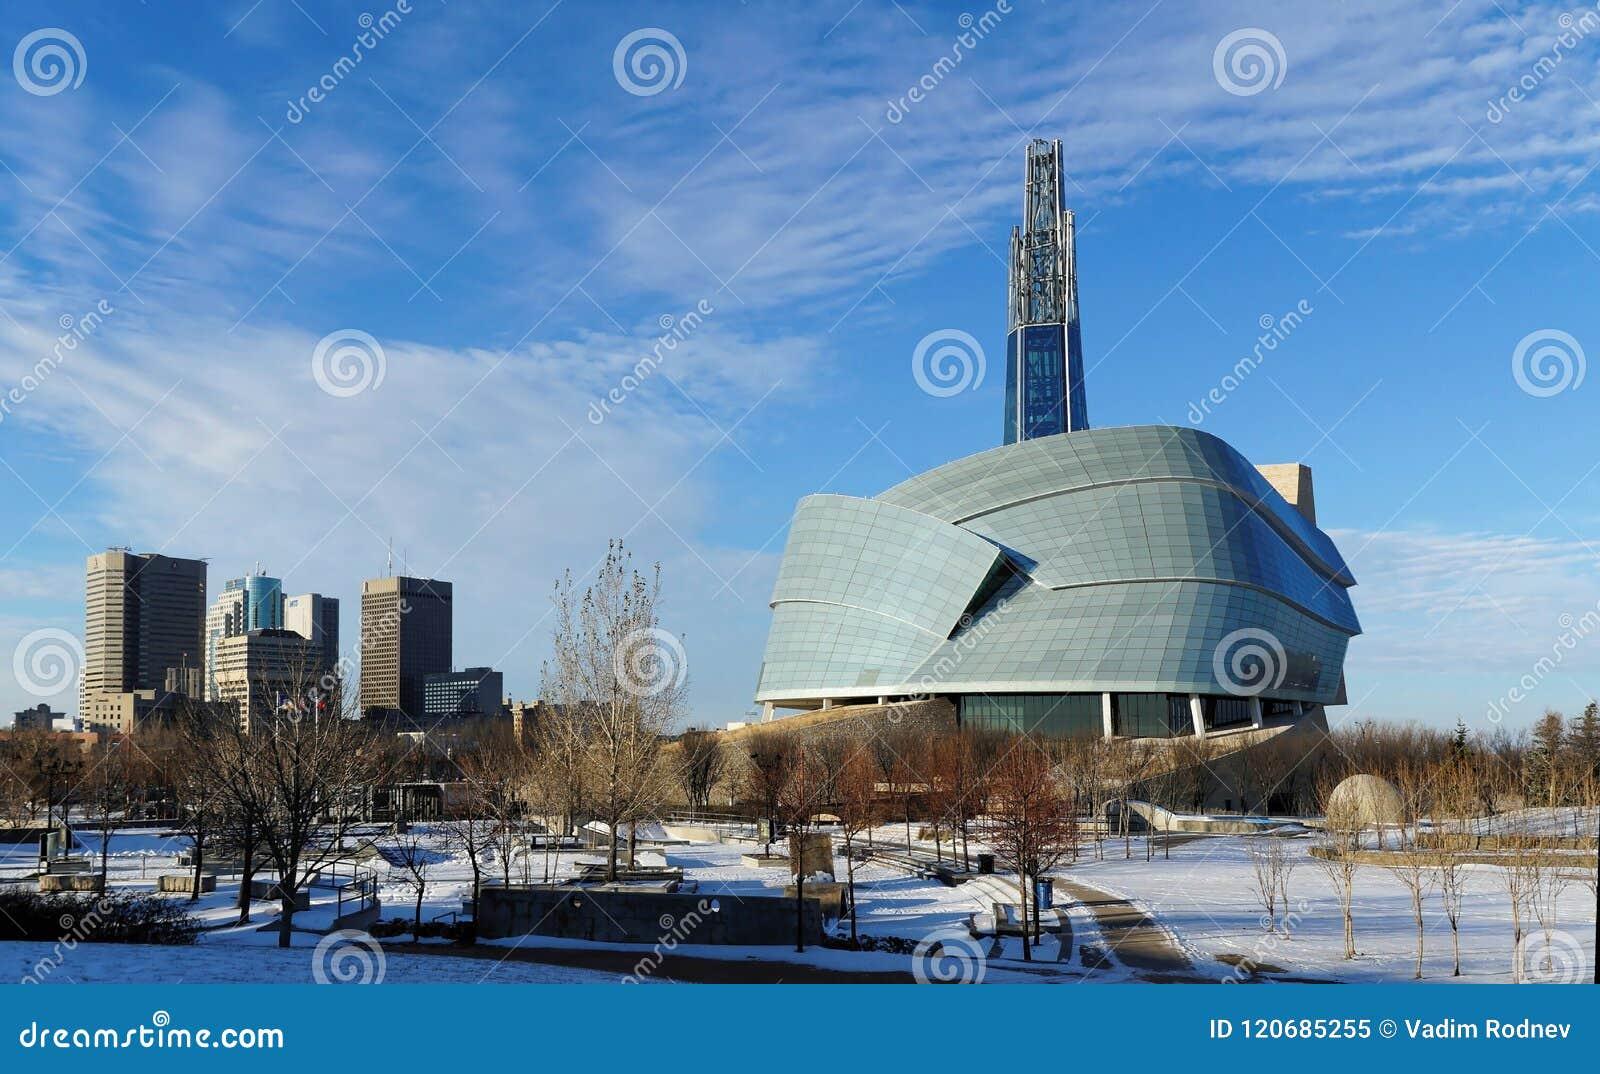 Winnipeg στο κέντρο της πόλης εικονική παράσταση πόλης Χειμερινή άποψη σχετικά με το καναδικό μουσείο τα ανθρώπινα δικαιώματα που